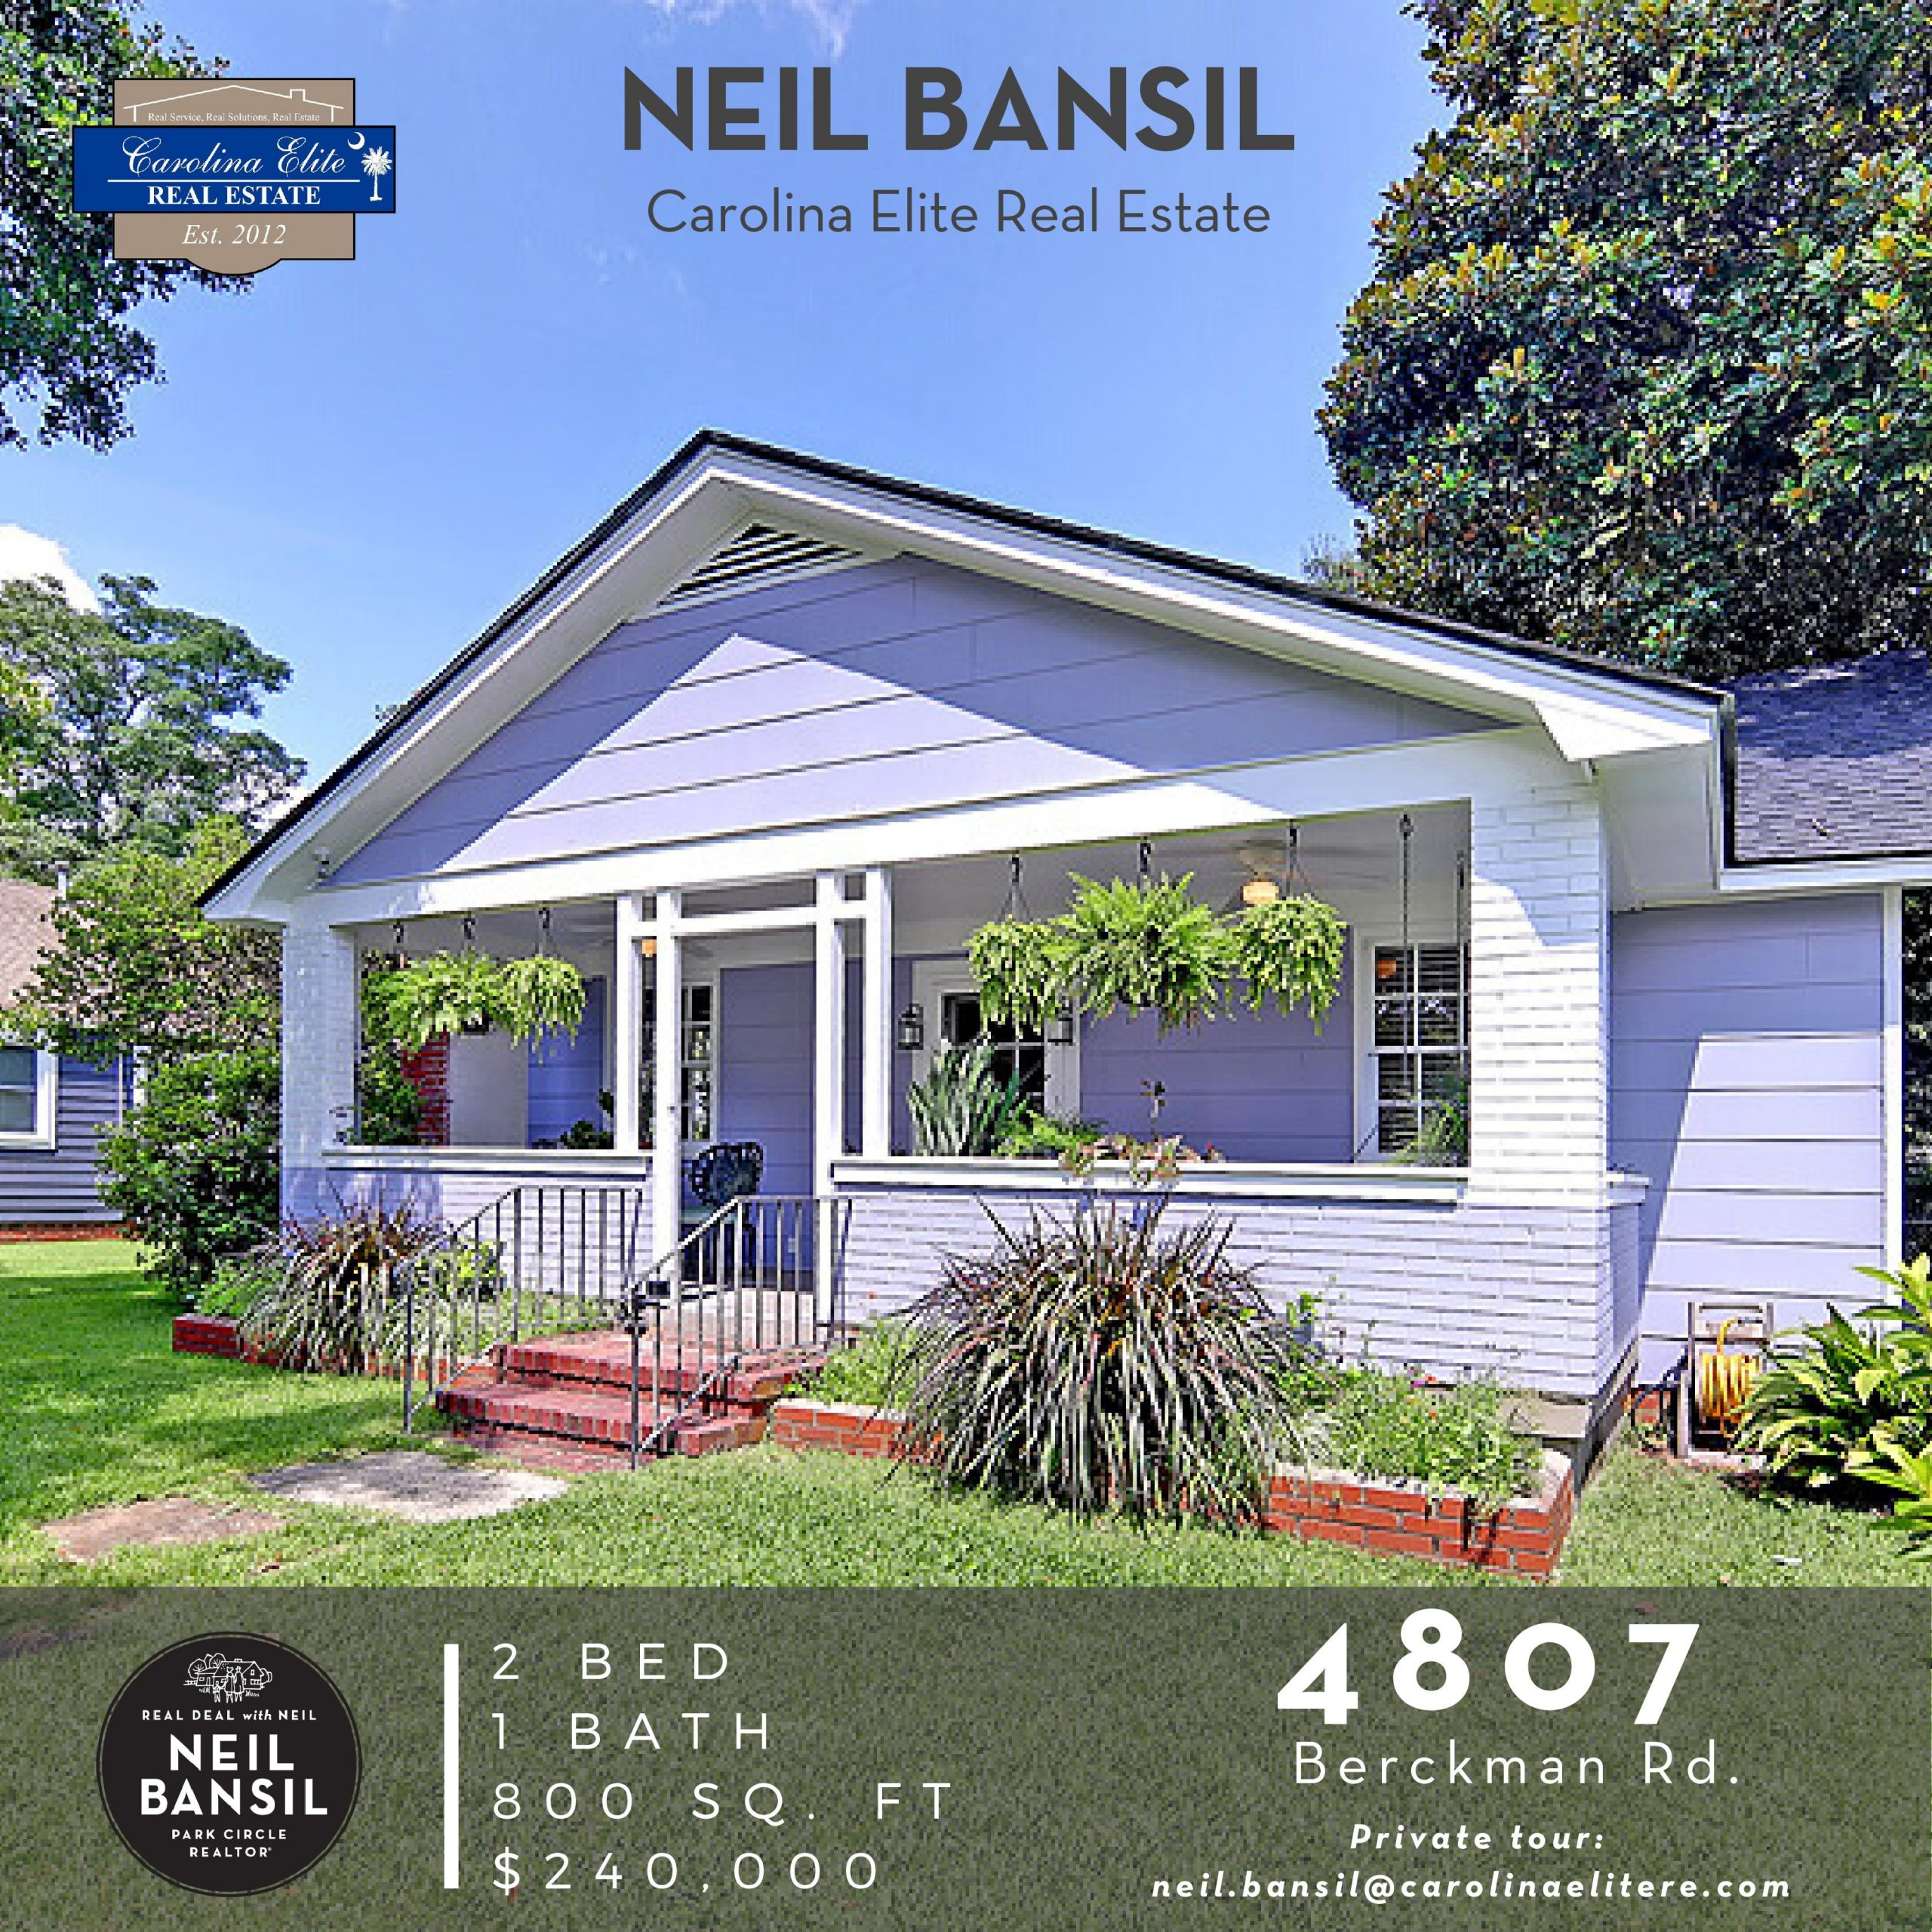 4807 Berckman Rd - Park Circle Home for Sale